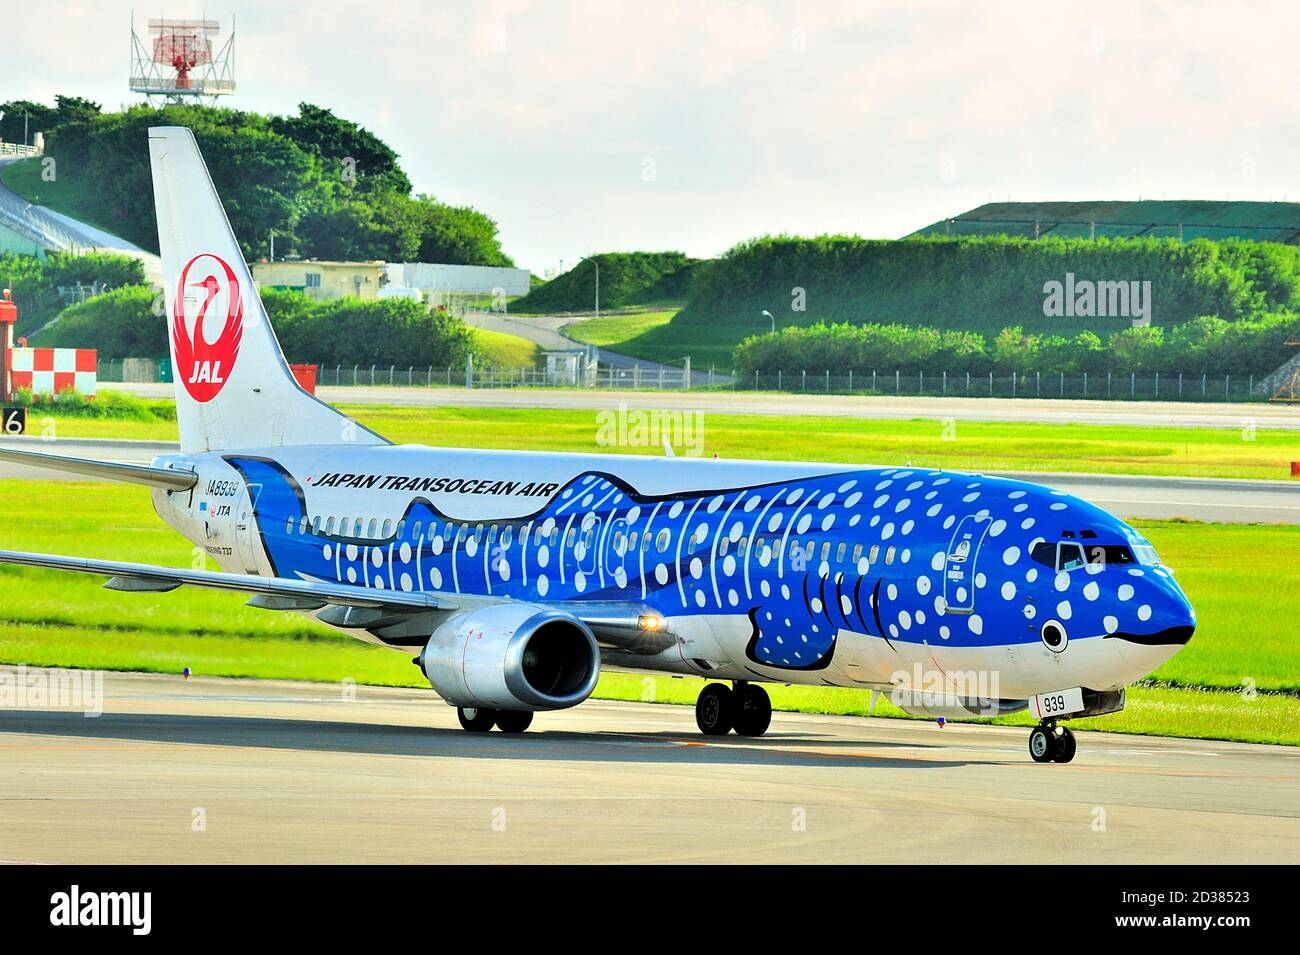 Japan Transocean Air, JTA, Boeing B-737/400, JA8939, Blue Whaleshark, Taxi After Landing, Naha Airport, Naha, Okinawa, Ryukyu Islands, Japan Stock Photo